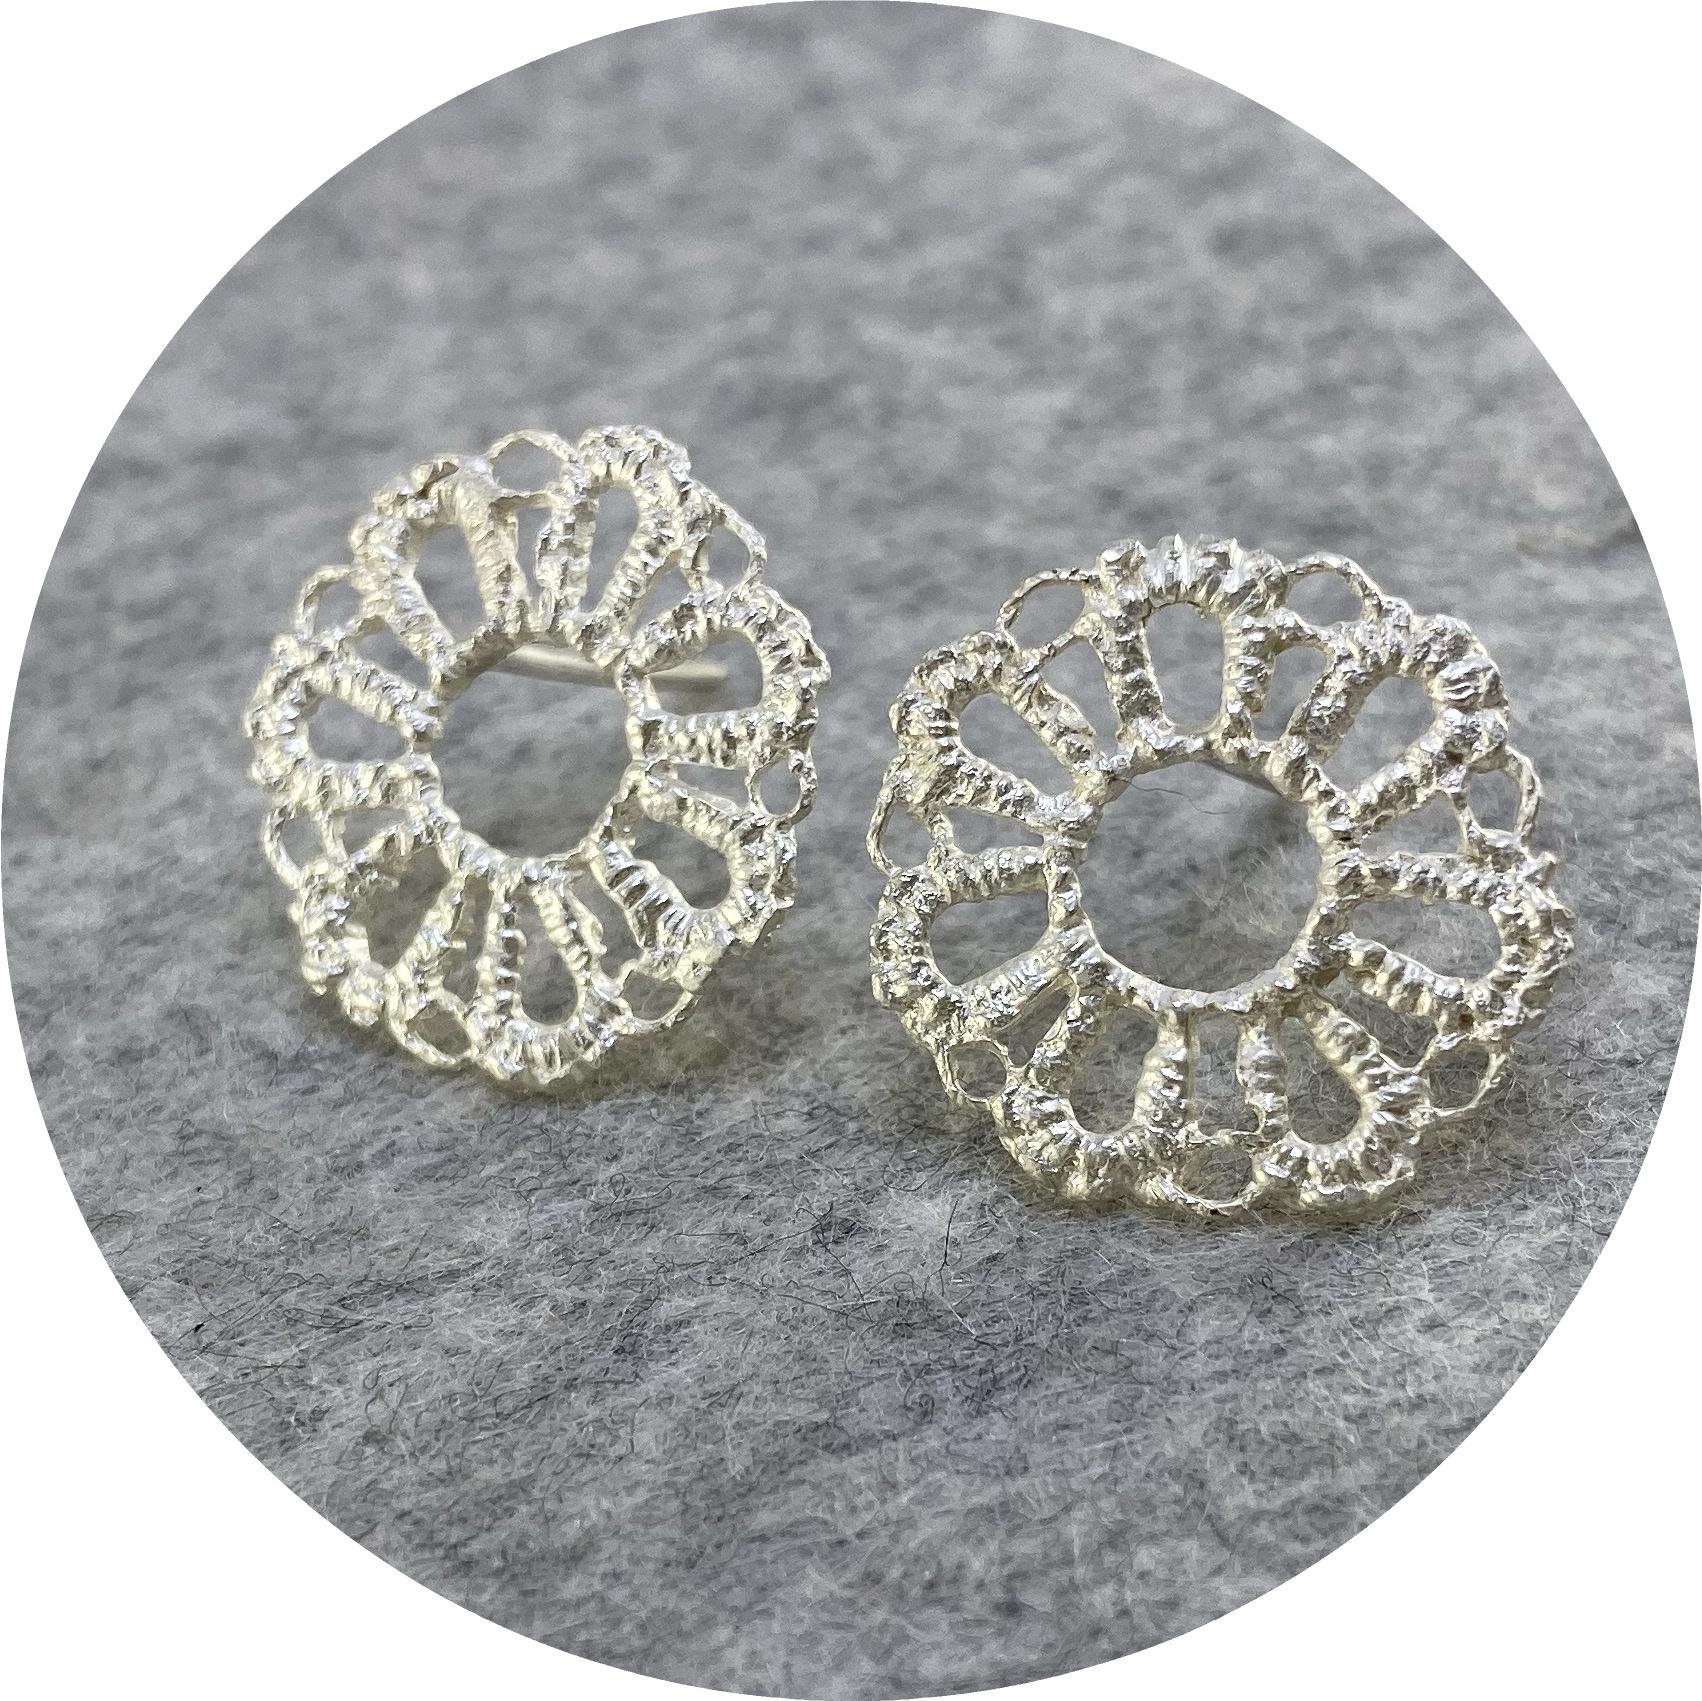 Pamela Camille- Tatted 7 petal flower studs. sterling silver.